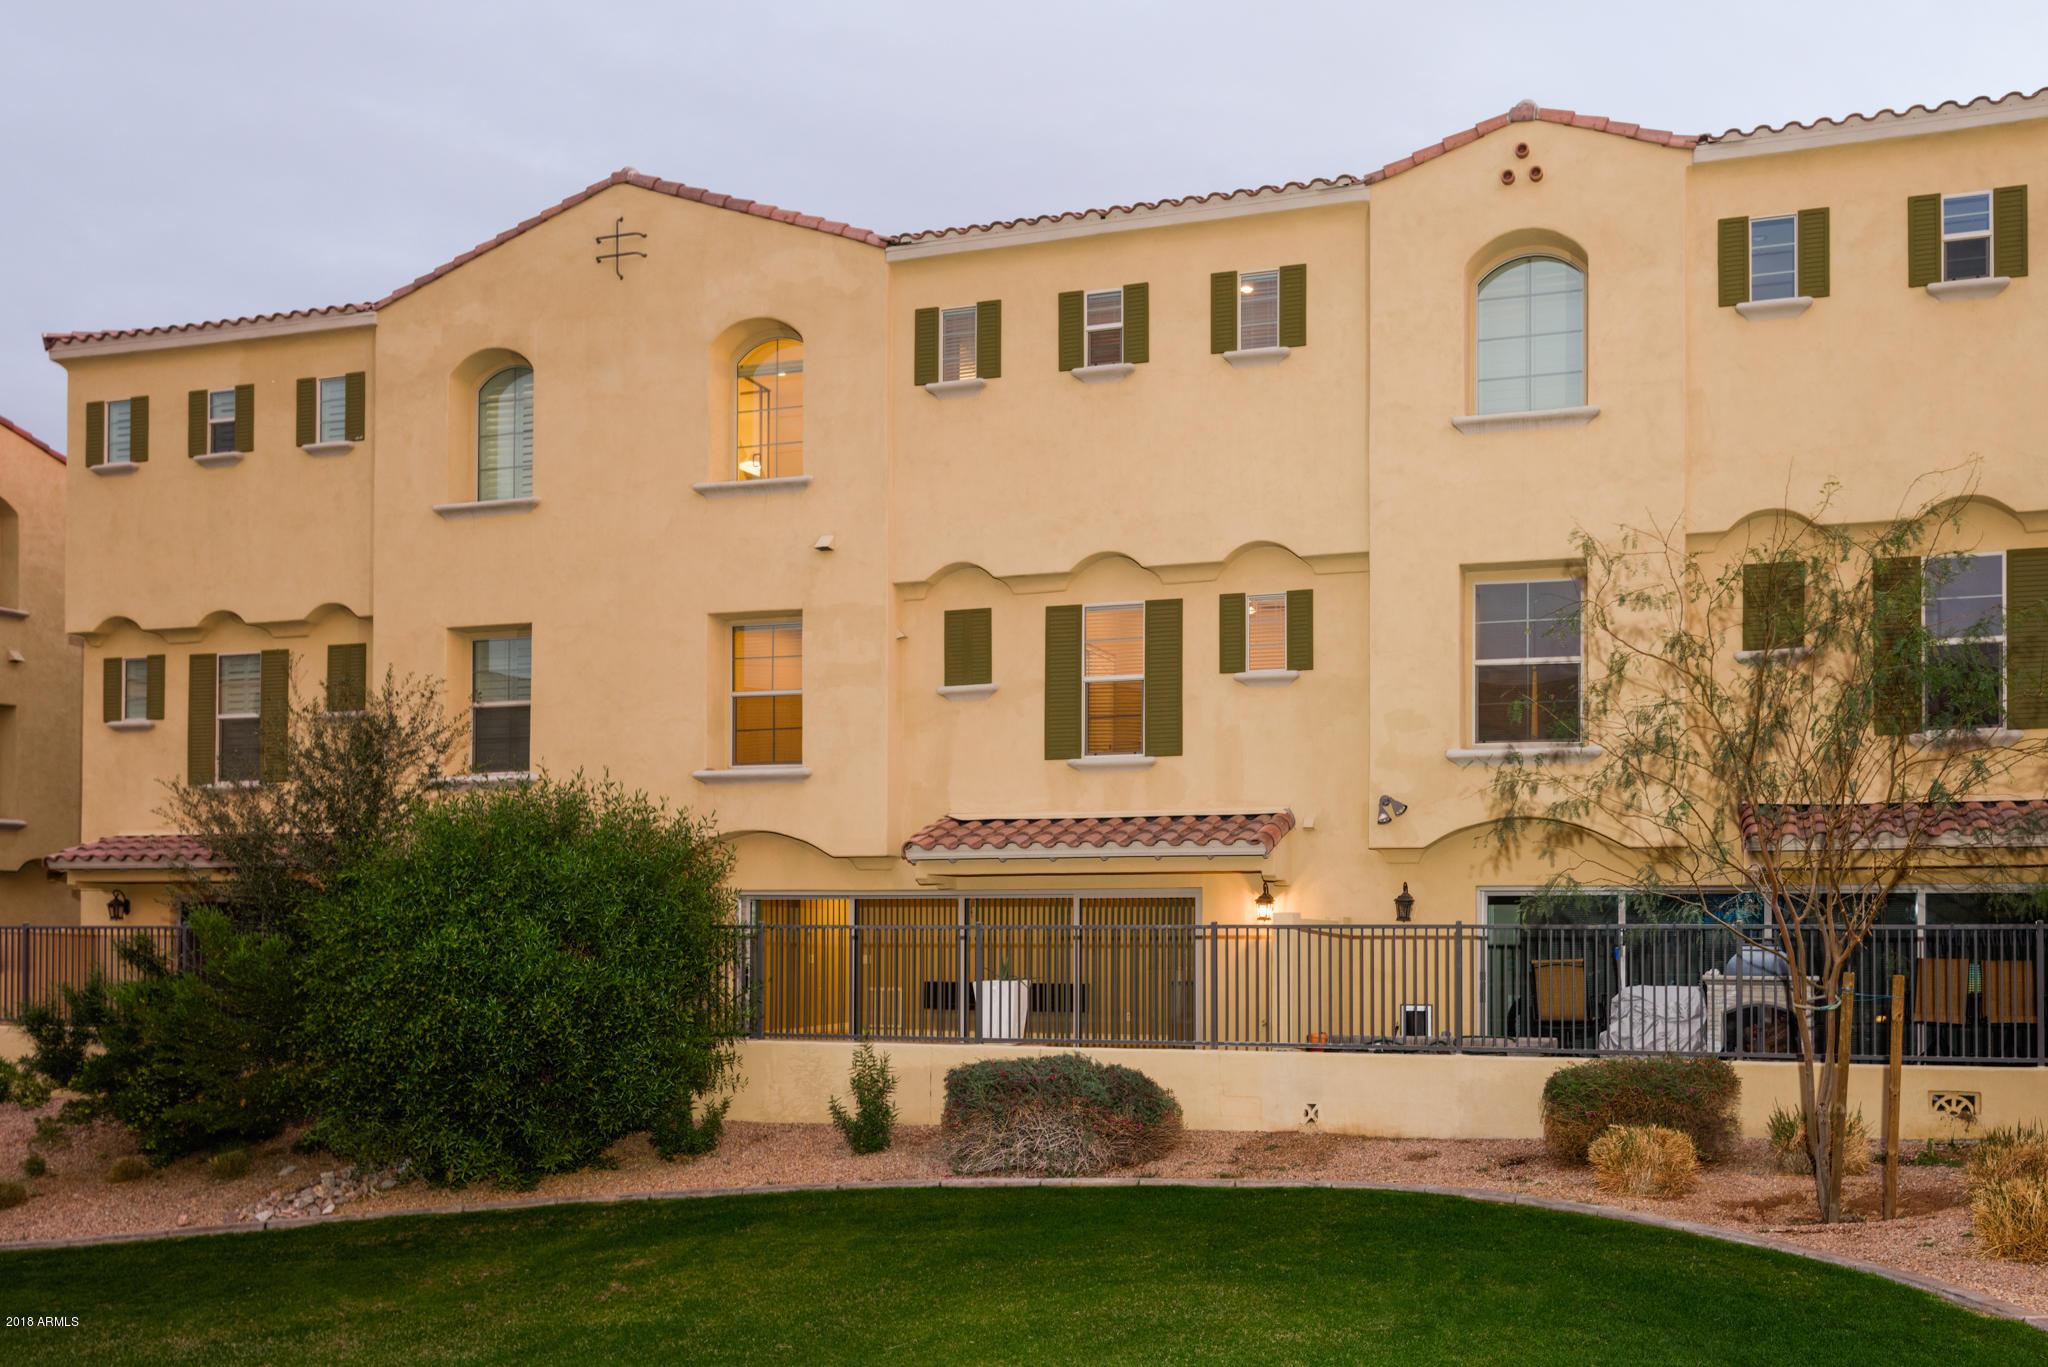 MLS 5751279 7116 W IVANHOE Street, Chandler, AZ Condos